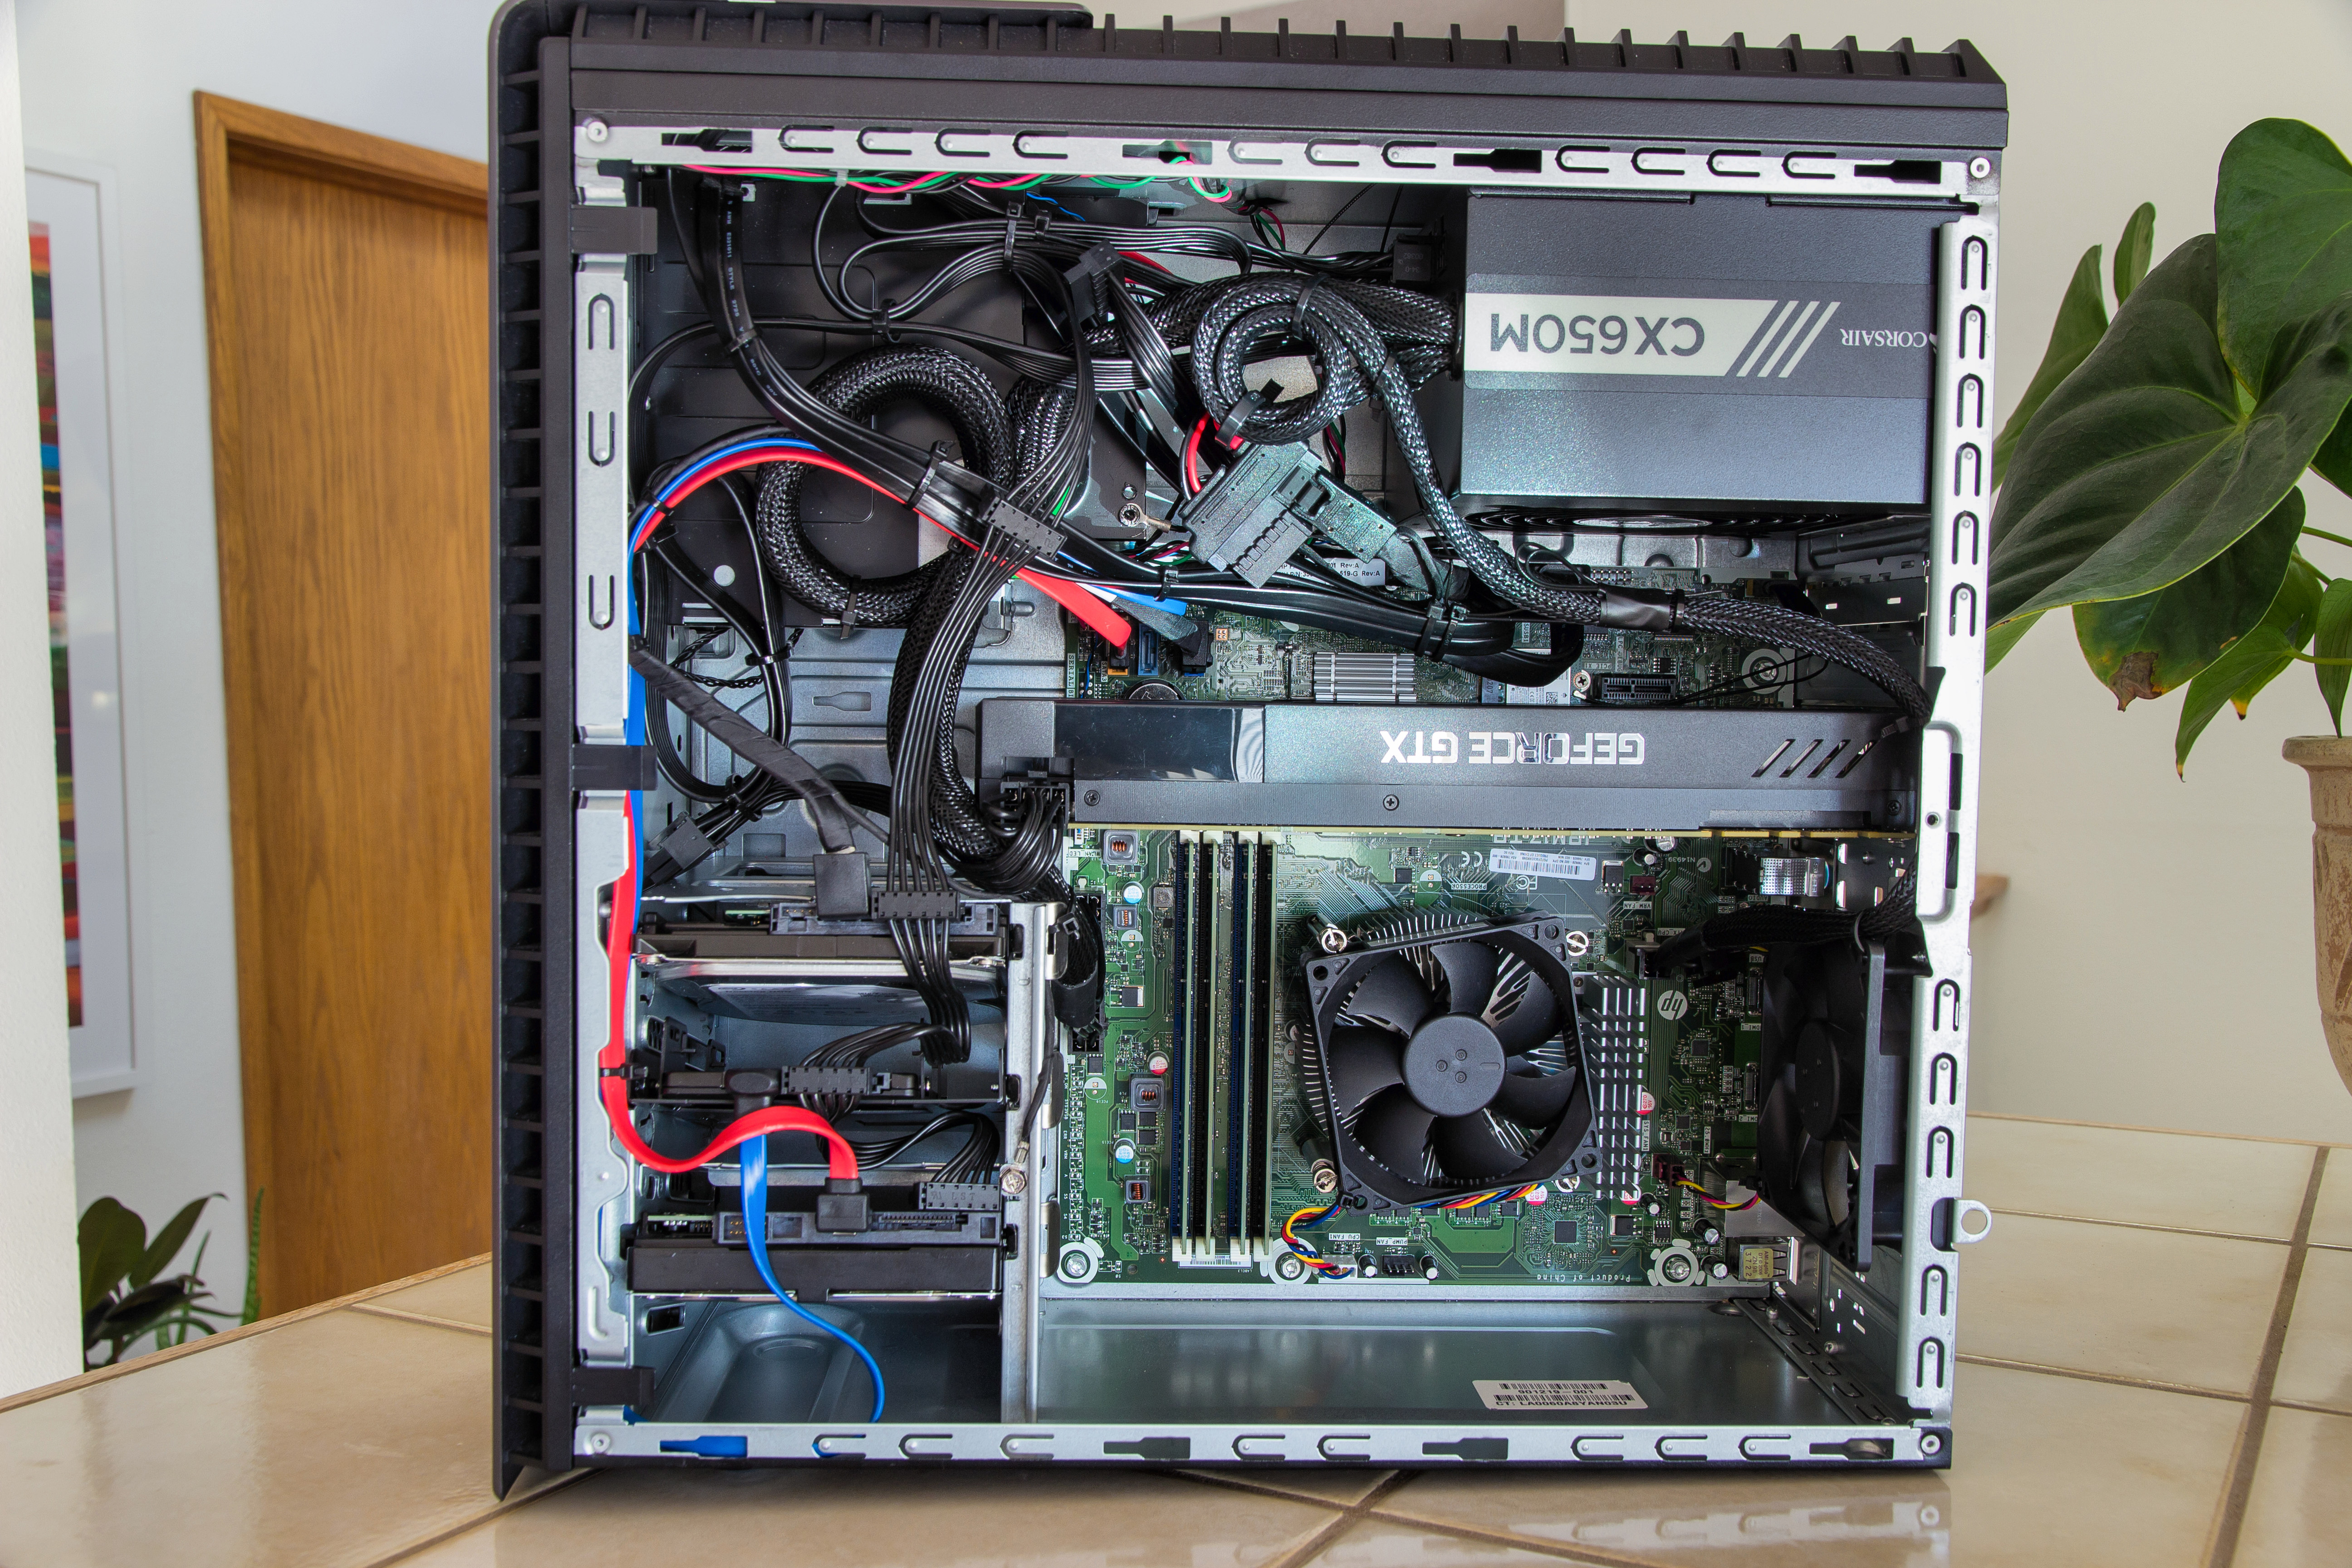 Solved: Want to upgrade my 870-244 gpu, cpu, psu - HP Support